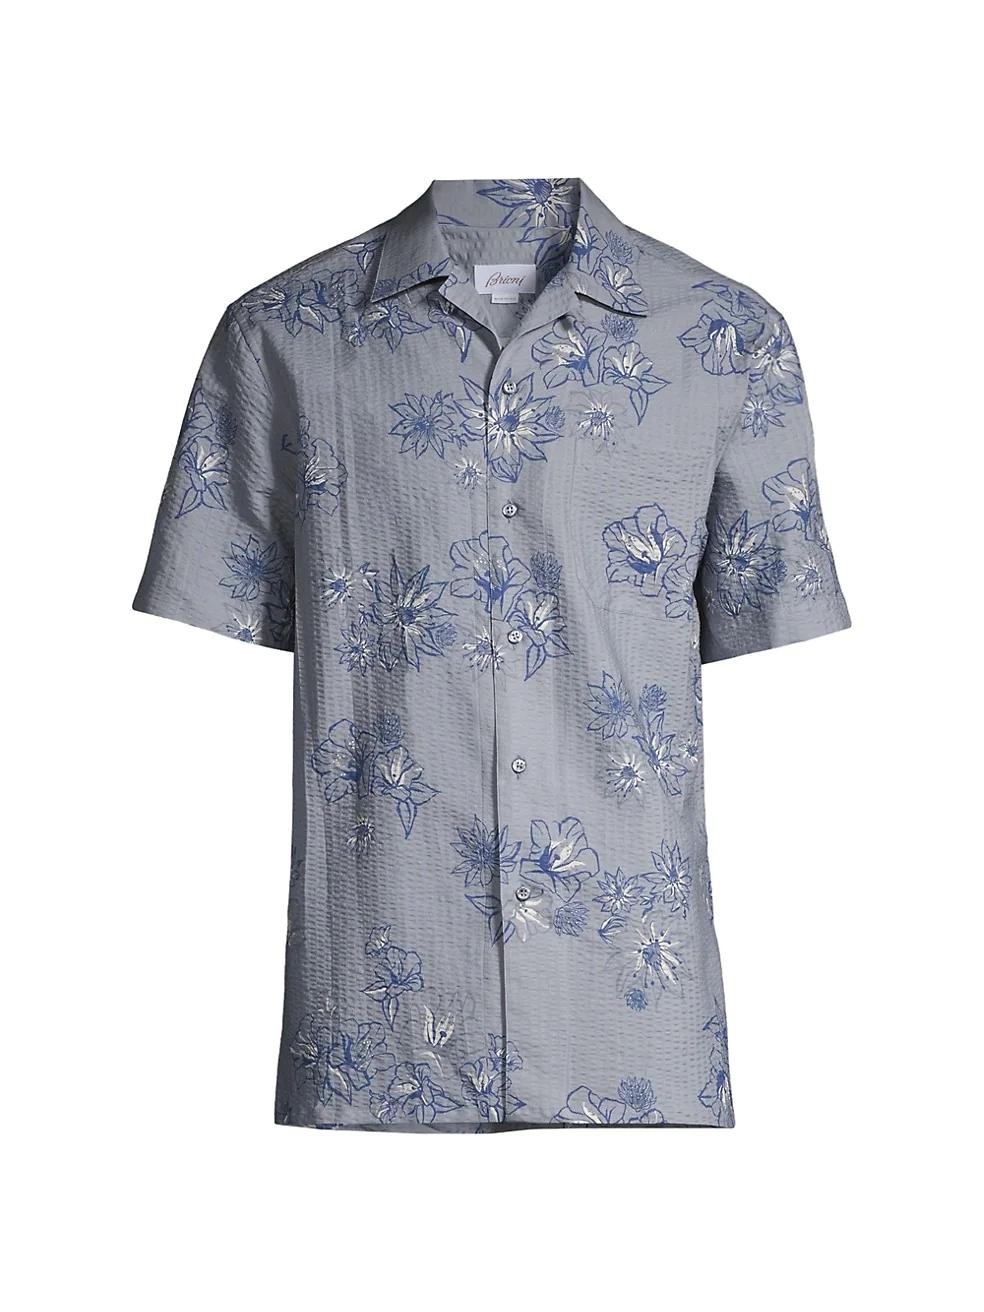 Saks Fifth Avenue官網:男士時尚專場 低至4折 收超多潮鞋 Ami Polo衫¥1121